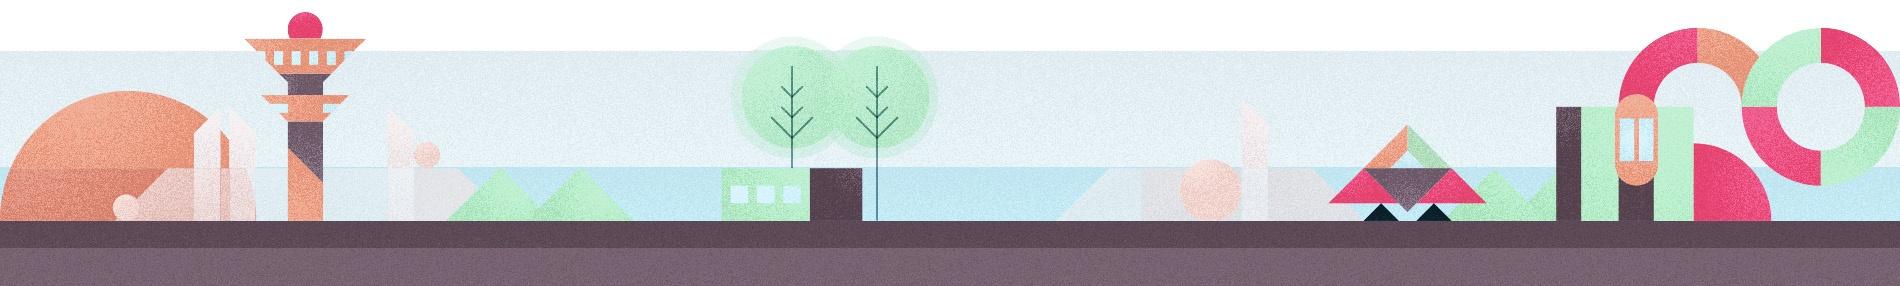 footer-design.jpg